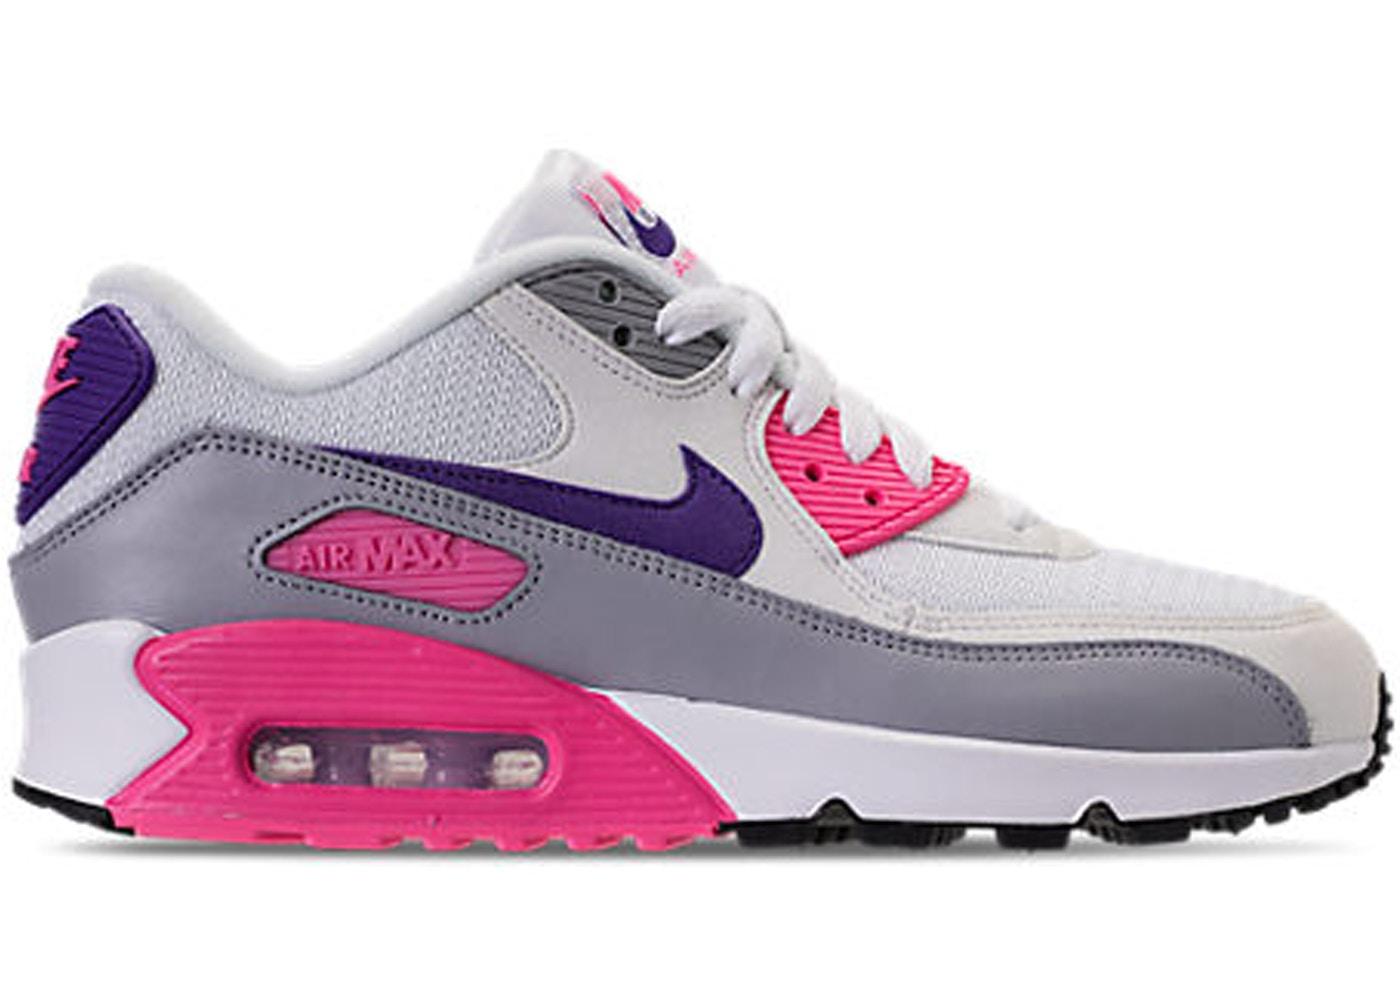 half off ce62c 9df30 Buy Nike Air Max 90 Shoes   Deadstock Sneakers